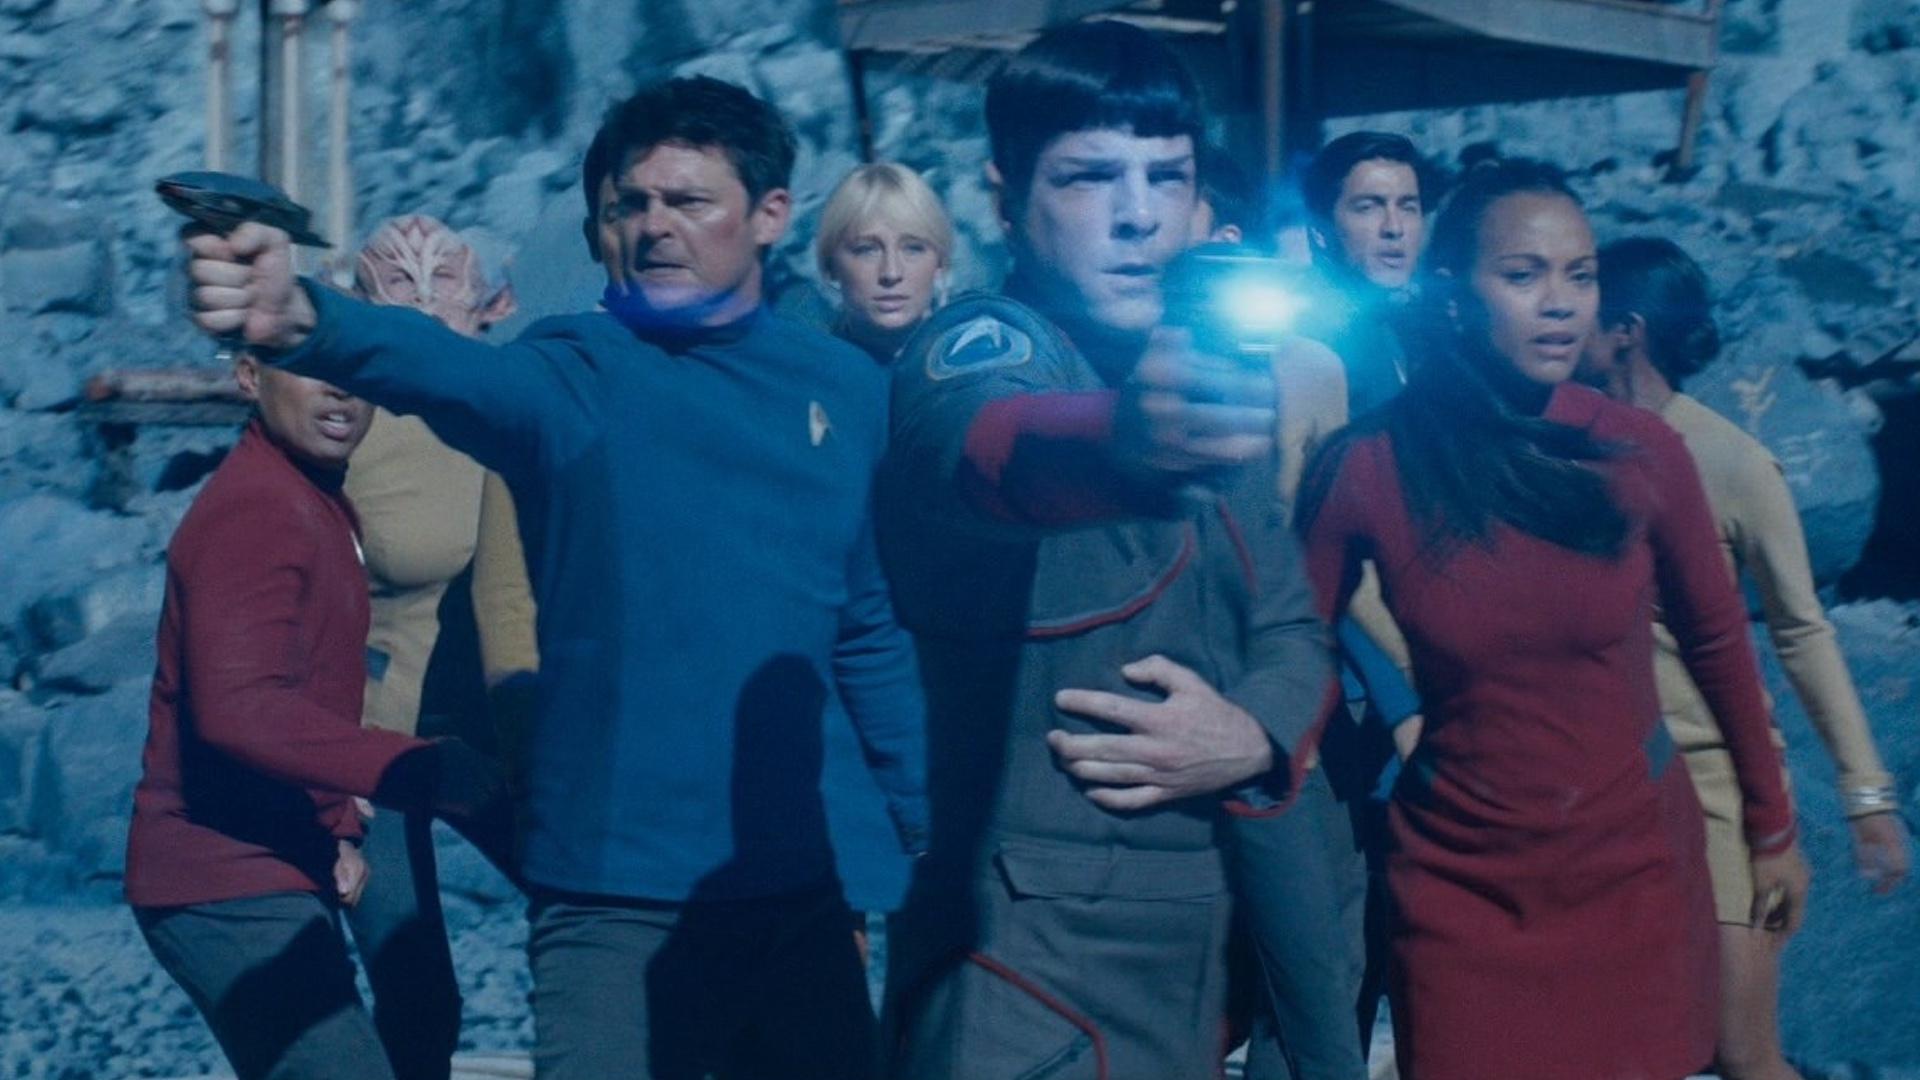 quentin-tarantinos-star-trek-film-is-said-to-feature-the-reboot-cast-social.jpg